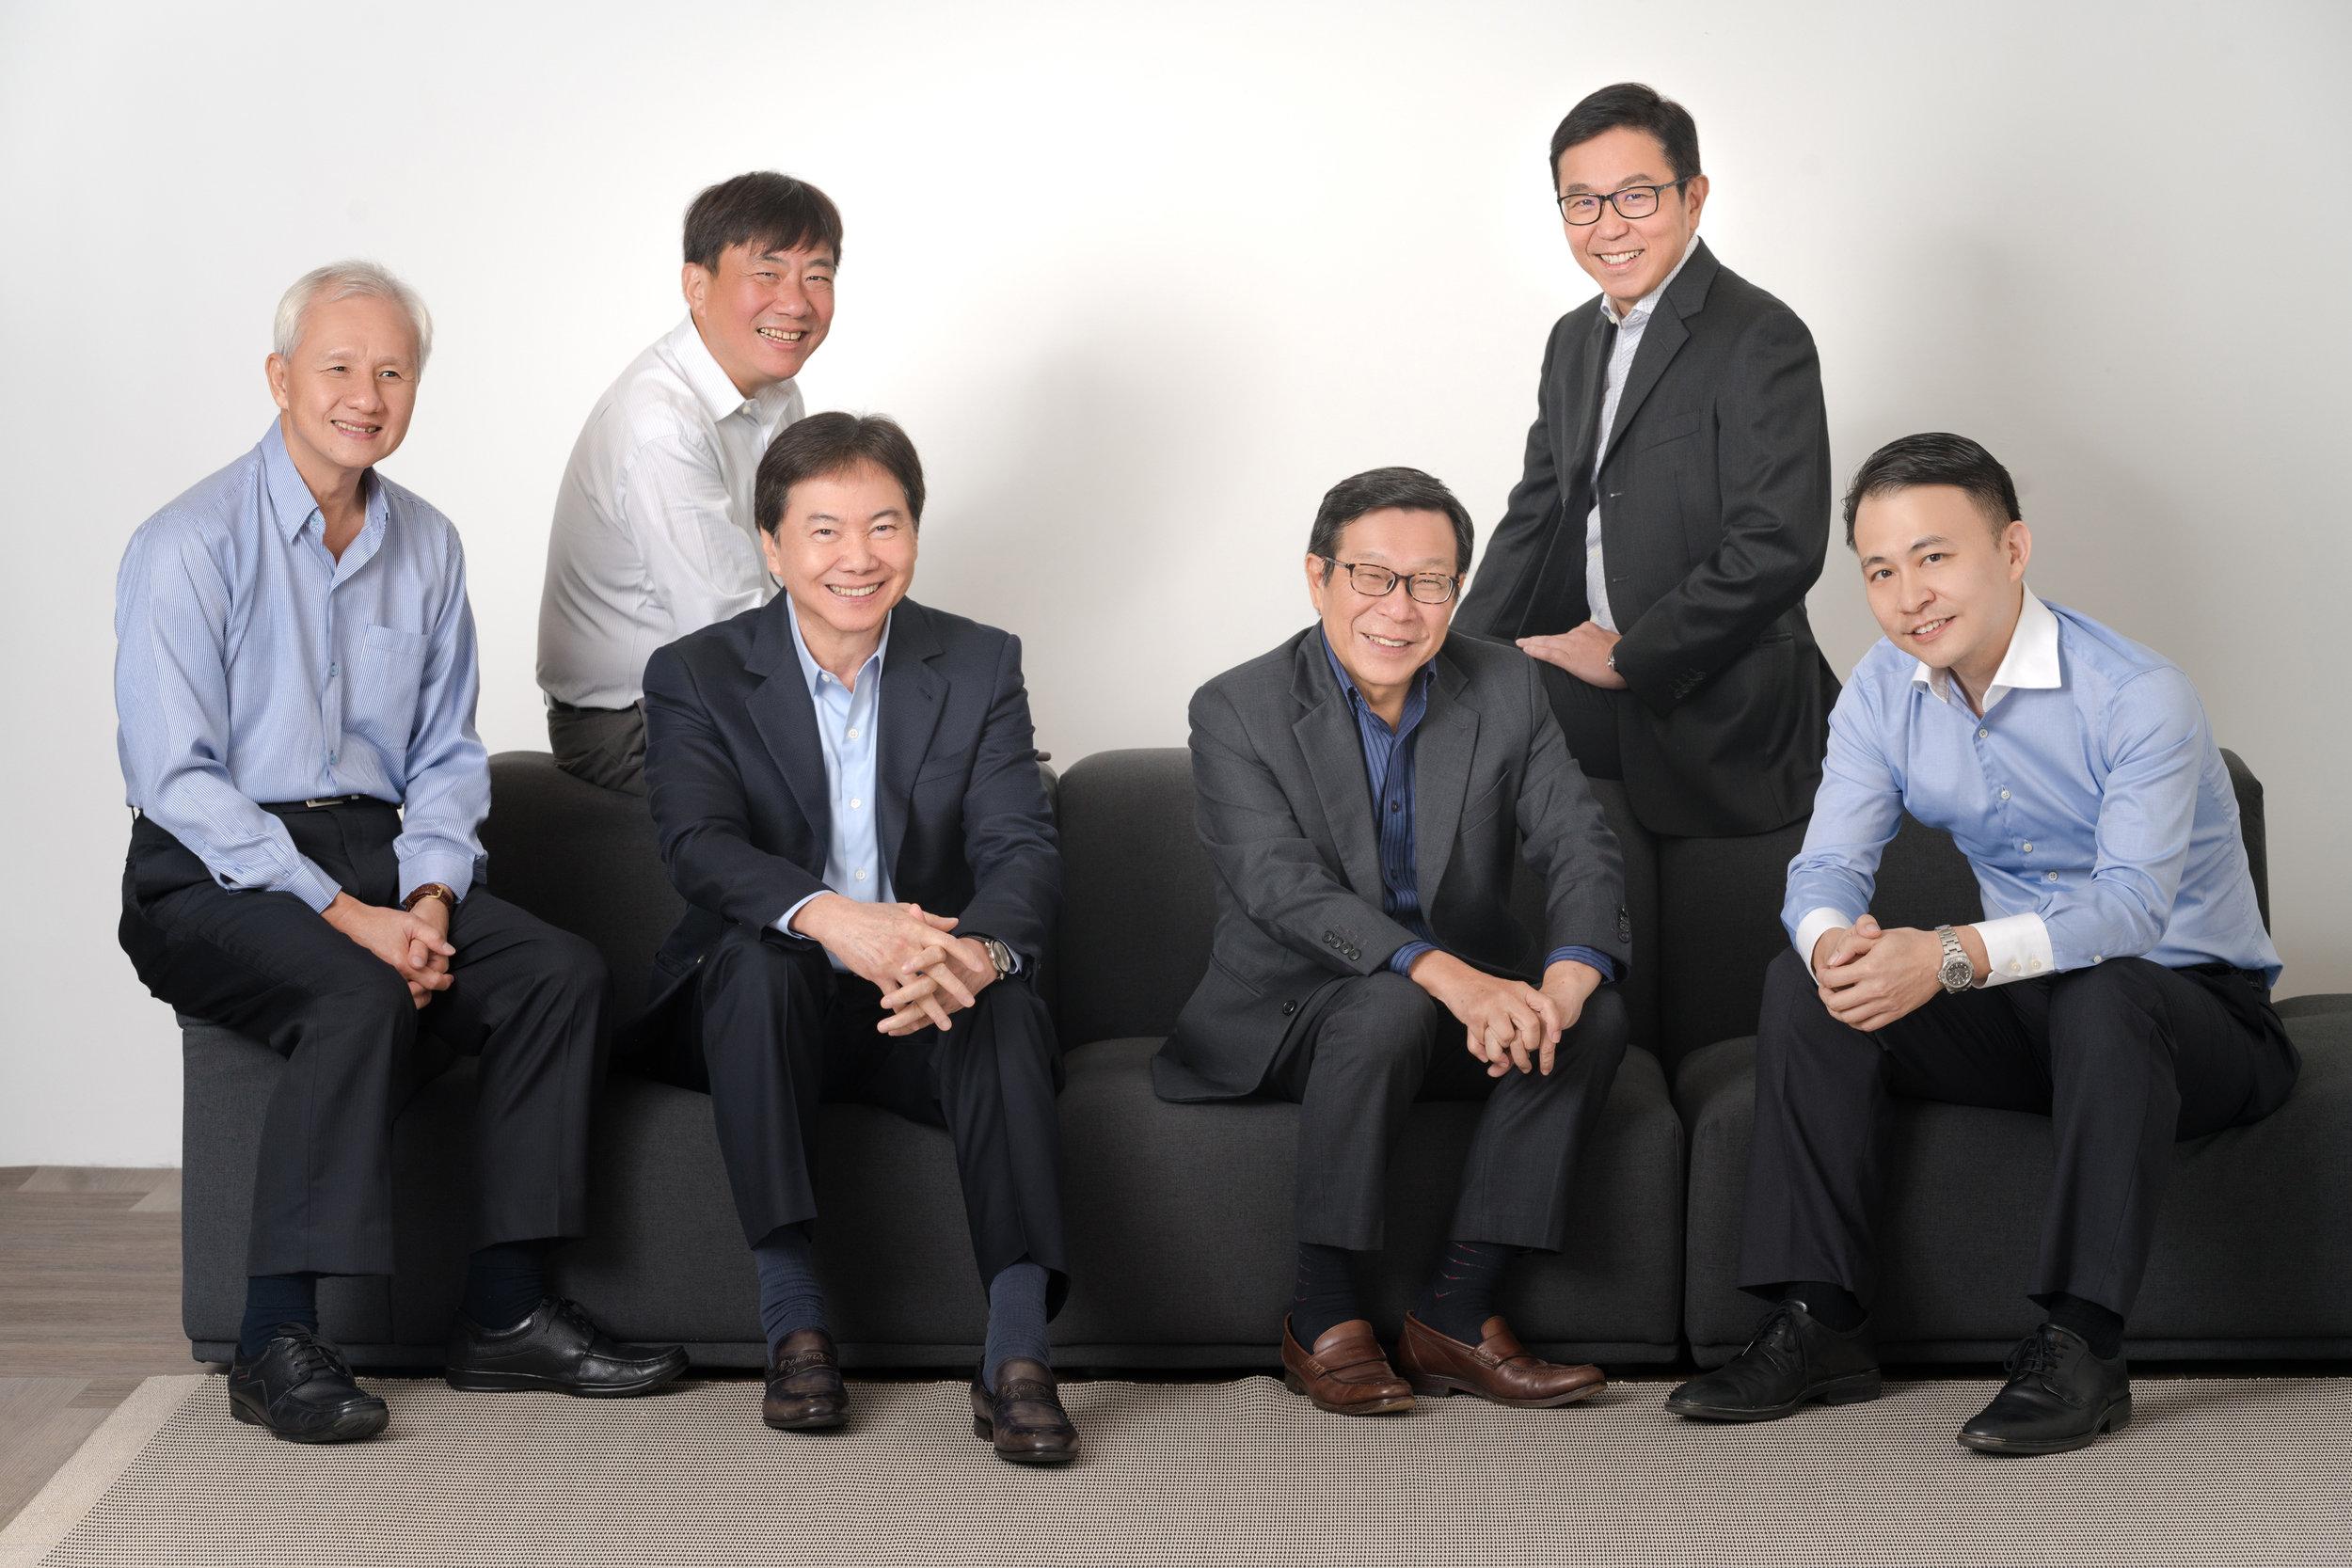 Board of Directors from left to right: Andrew Tay, Stanley Tan, Pang Yoke Min, Mah Bow Tan, Ng Tiong Gee, Loo Wen Lieh